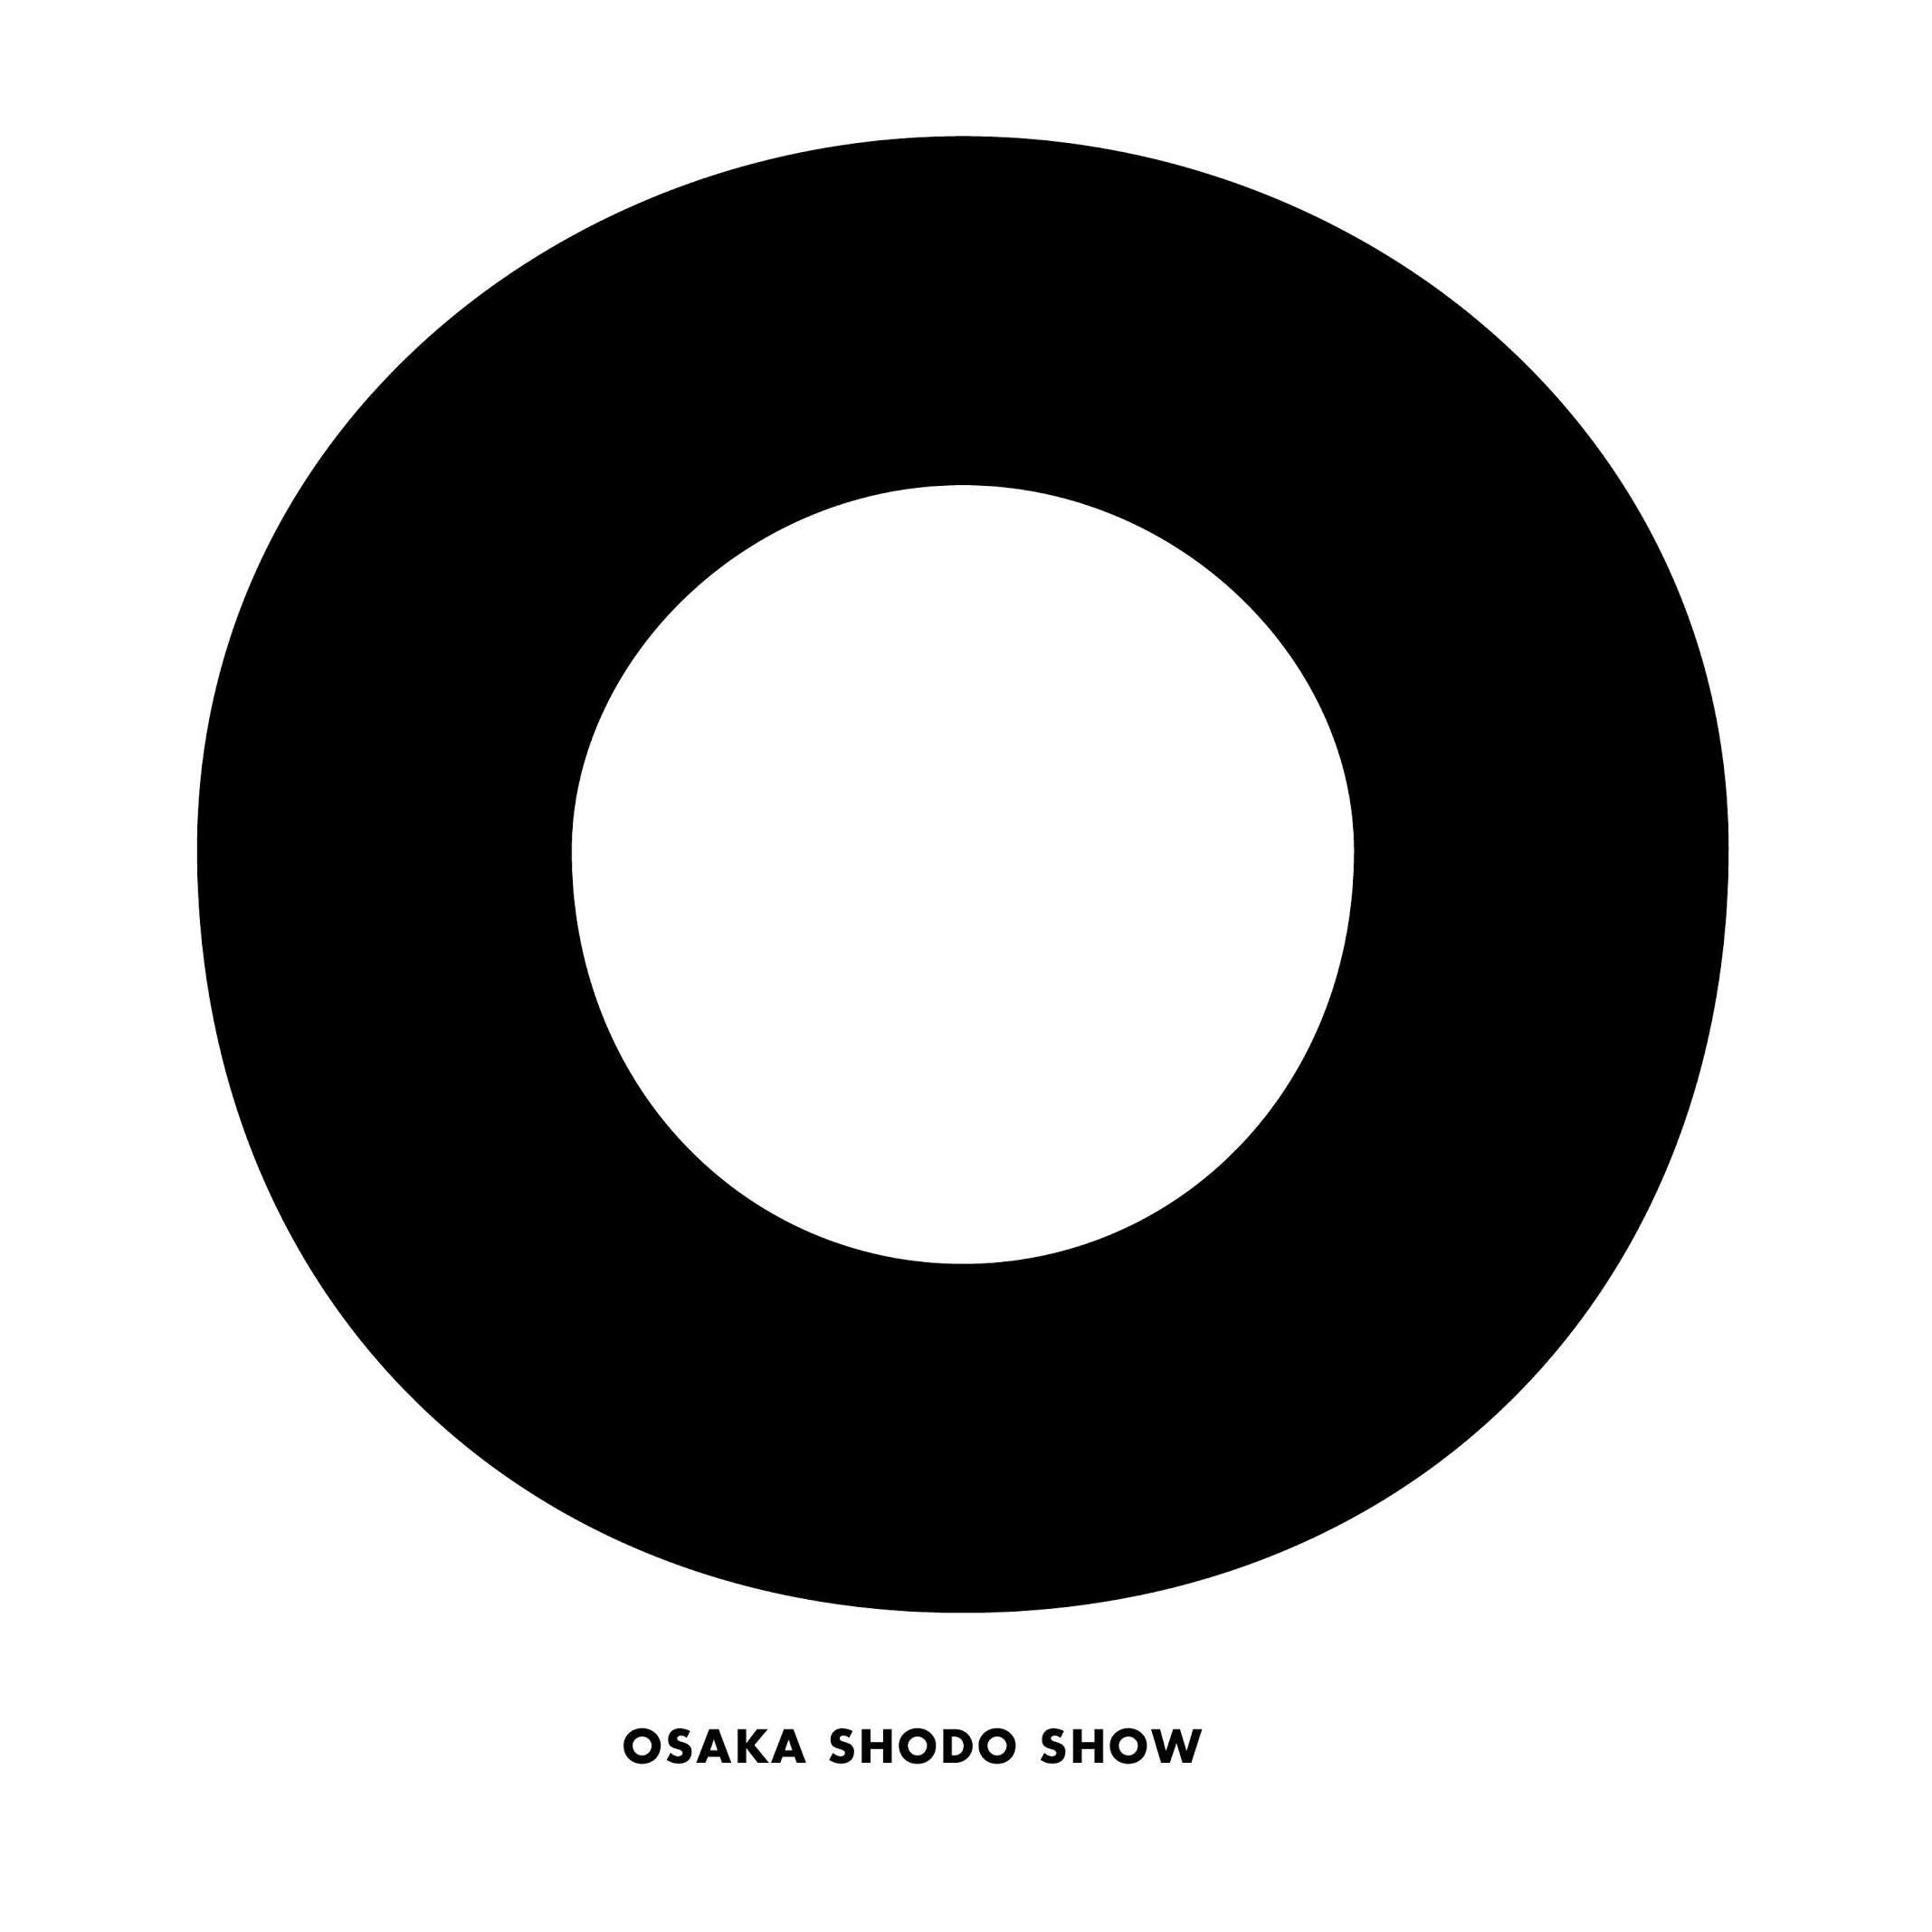 OSAKA SHODO SHOW 2020